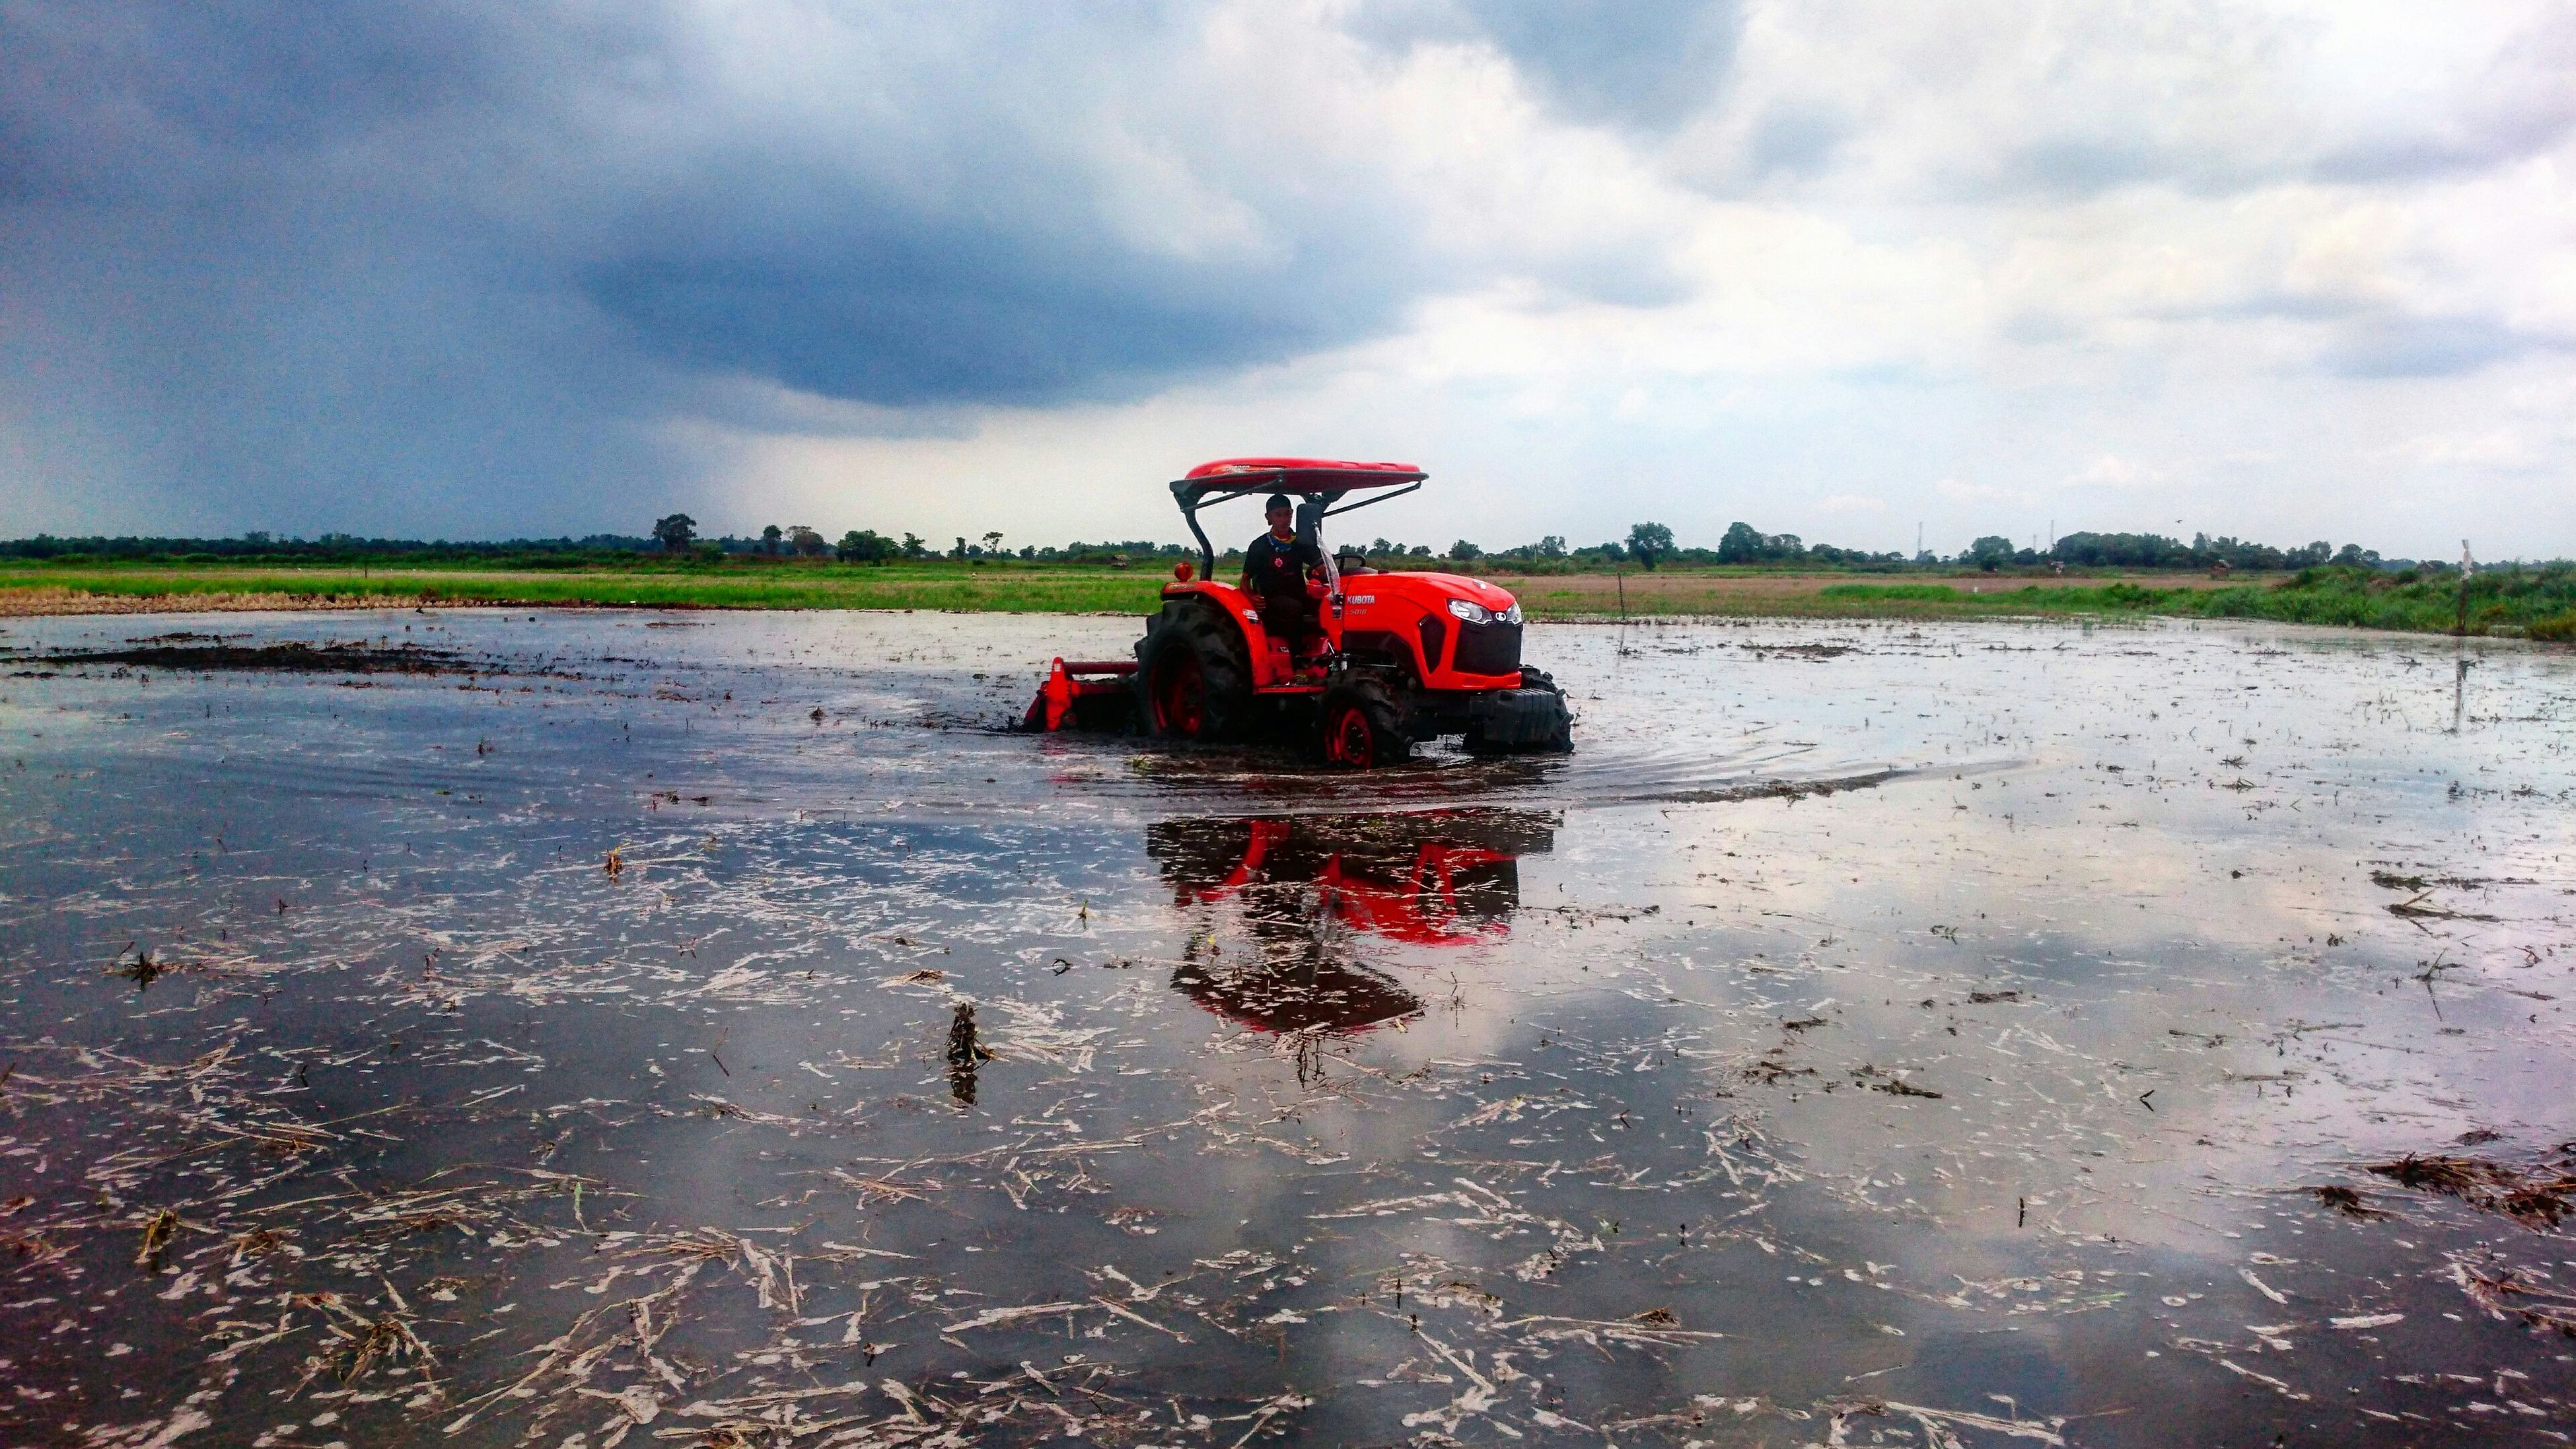 Tractor test L5018 at Pemulutan Palembang Tractor Kubota L5018 L Series Rotary Farm Machinery Farm Tractors Cultivation Paddy Field Wet Paddy